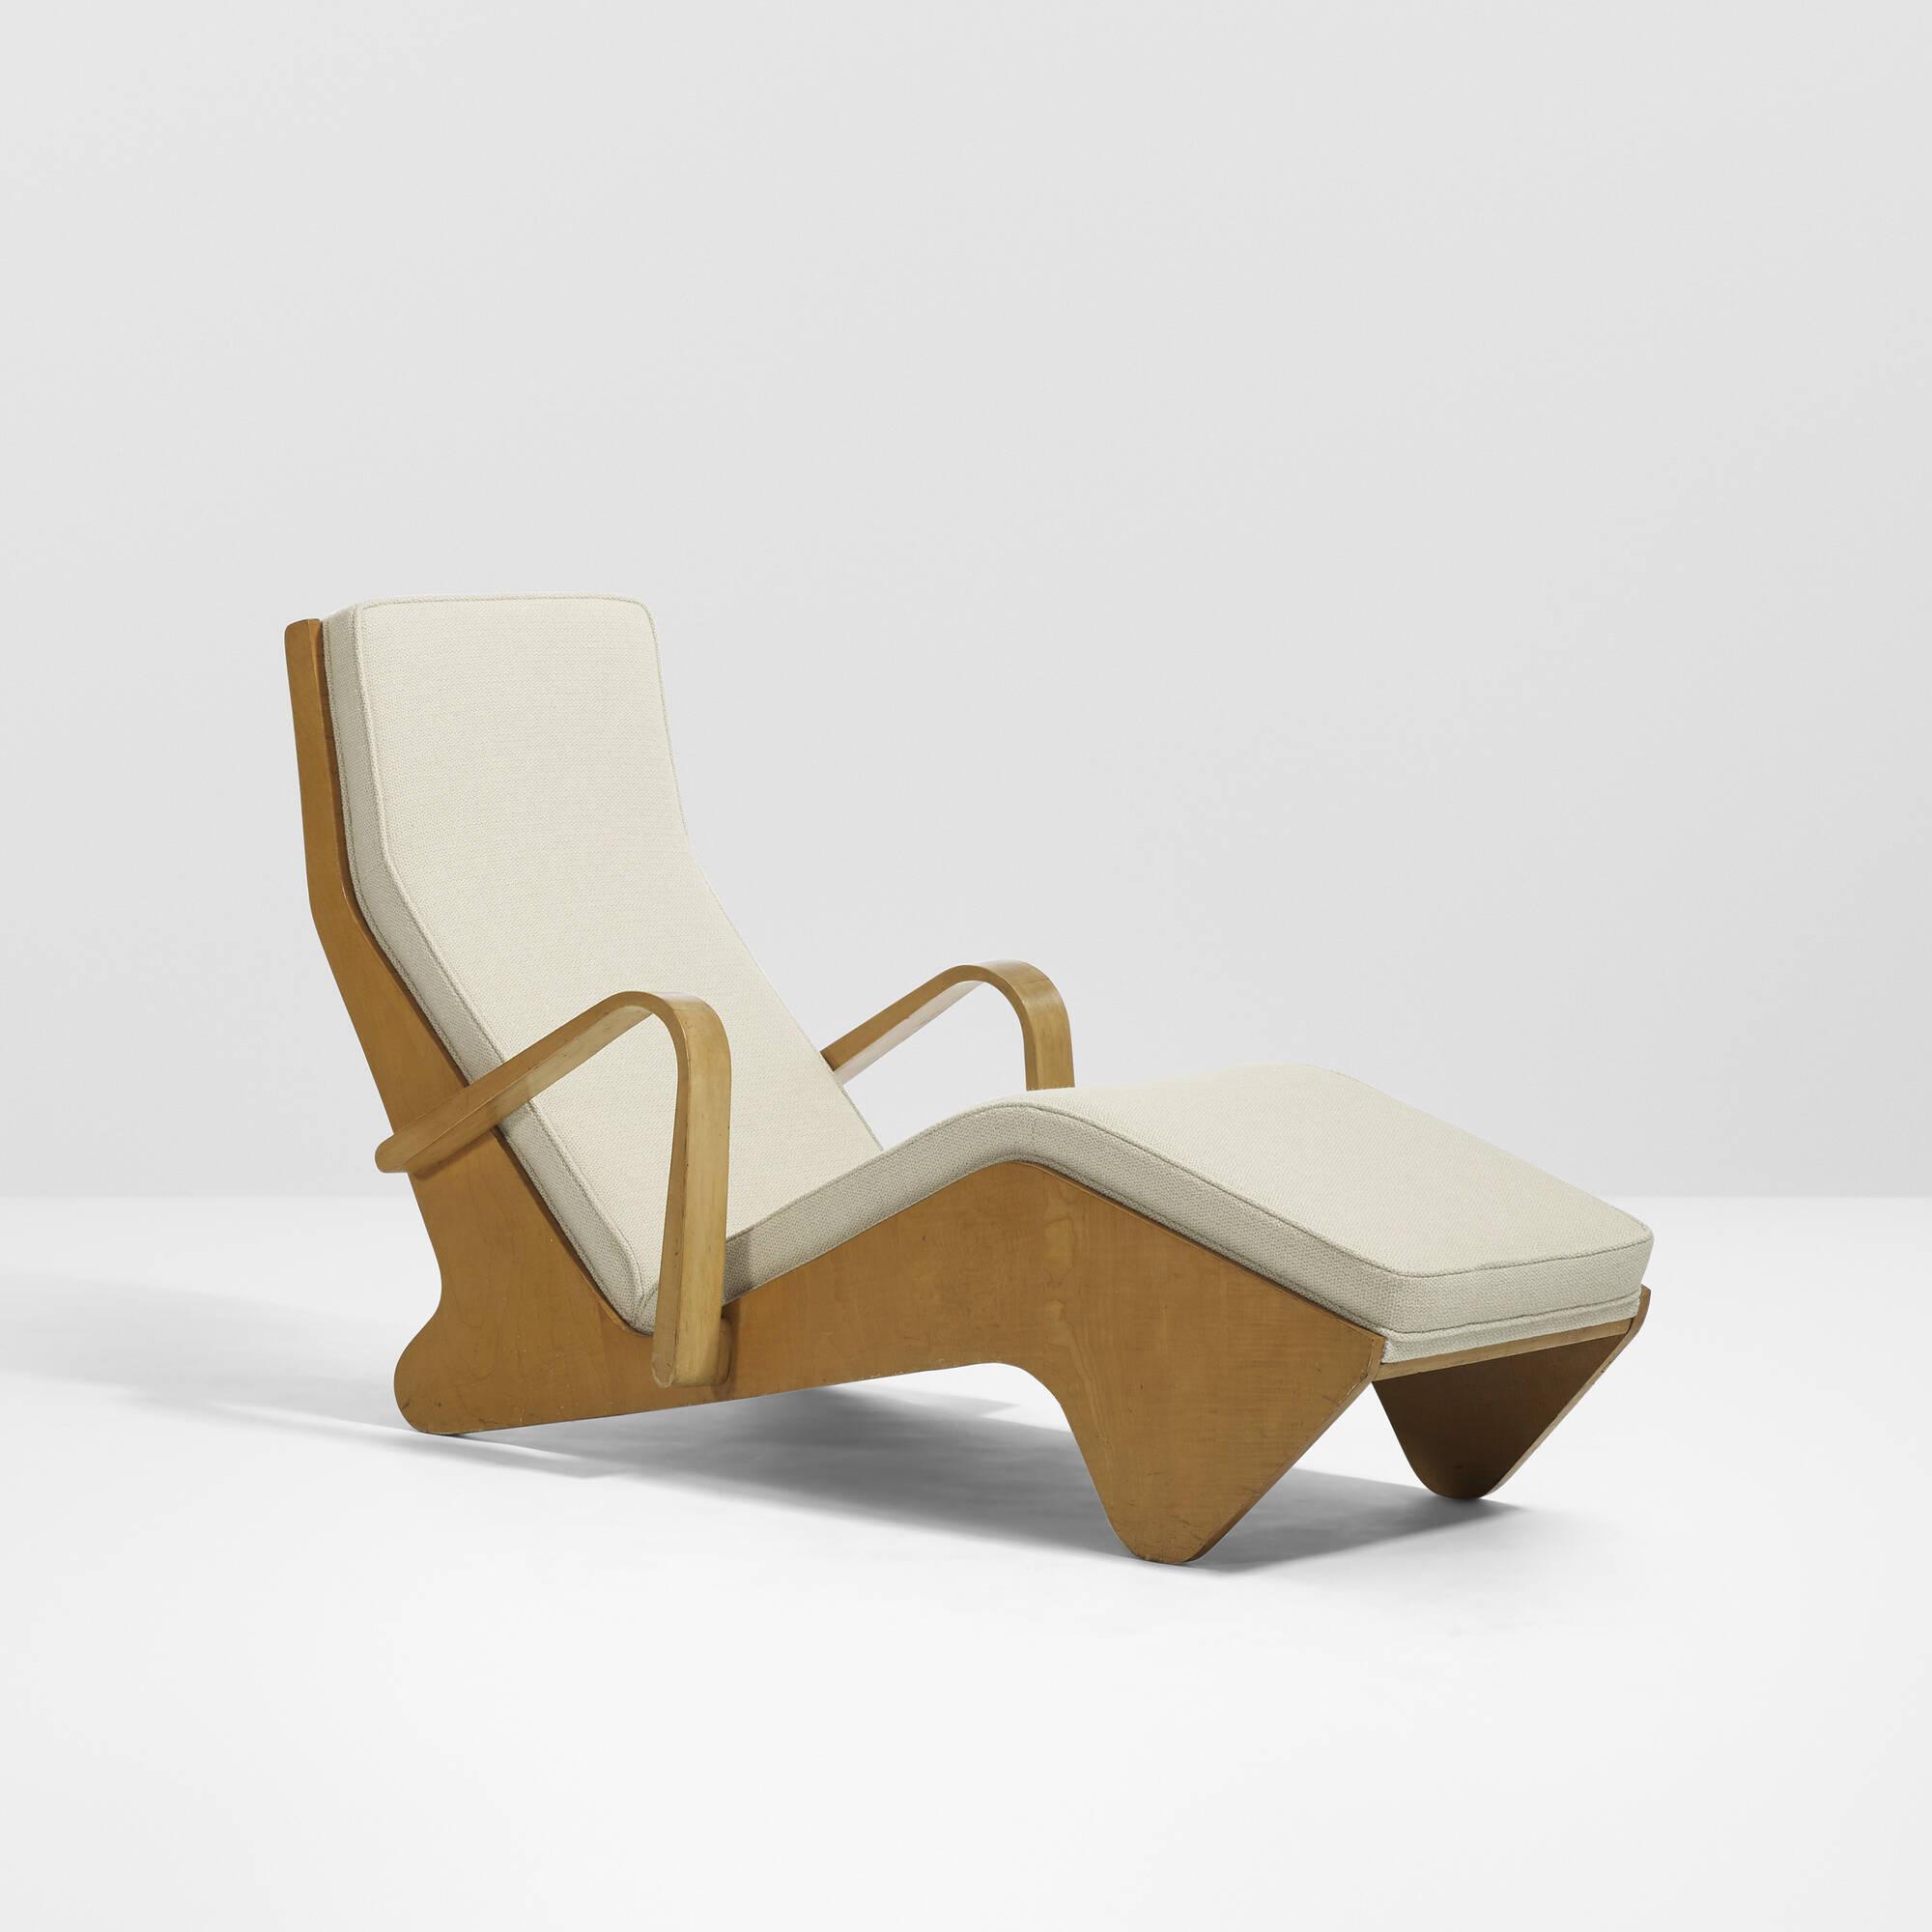 19 marcel breuer rare chaise lounge for Breuer chaise longue